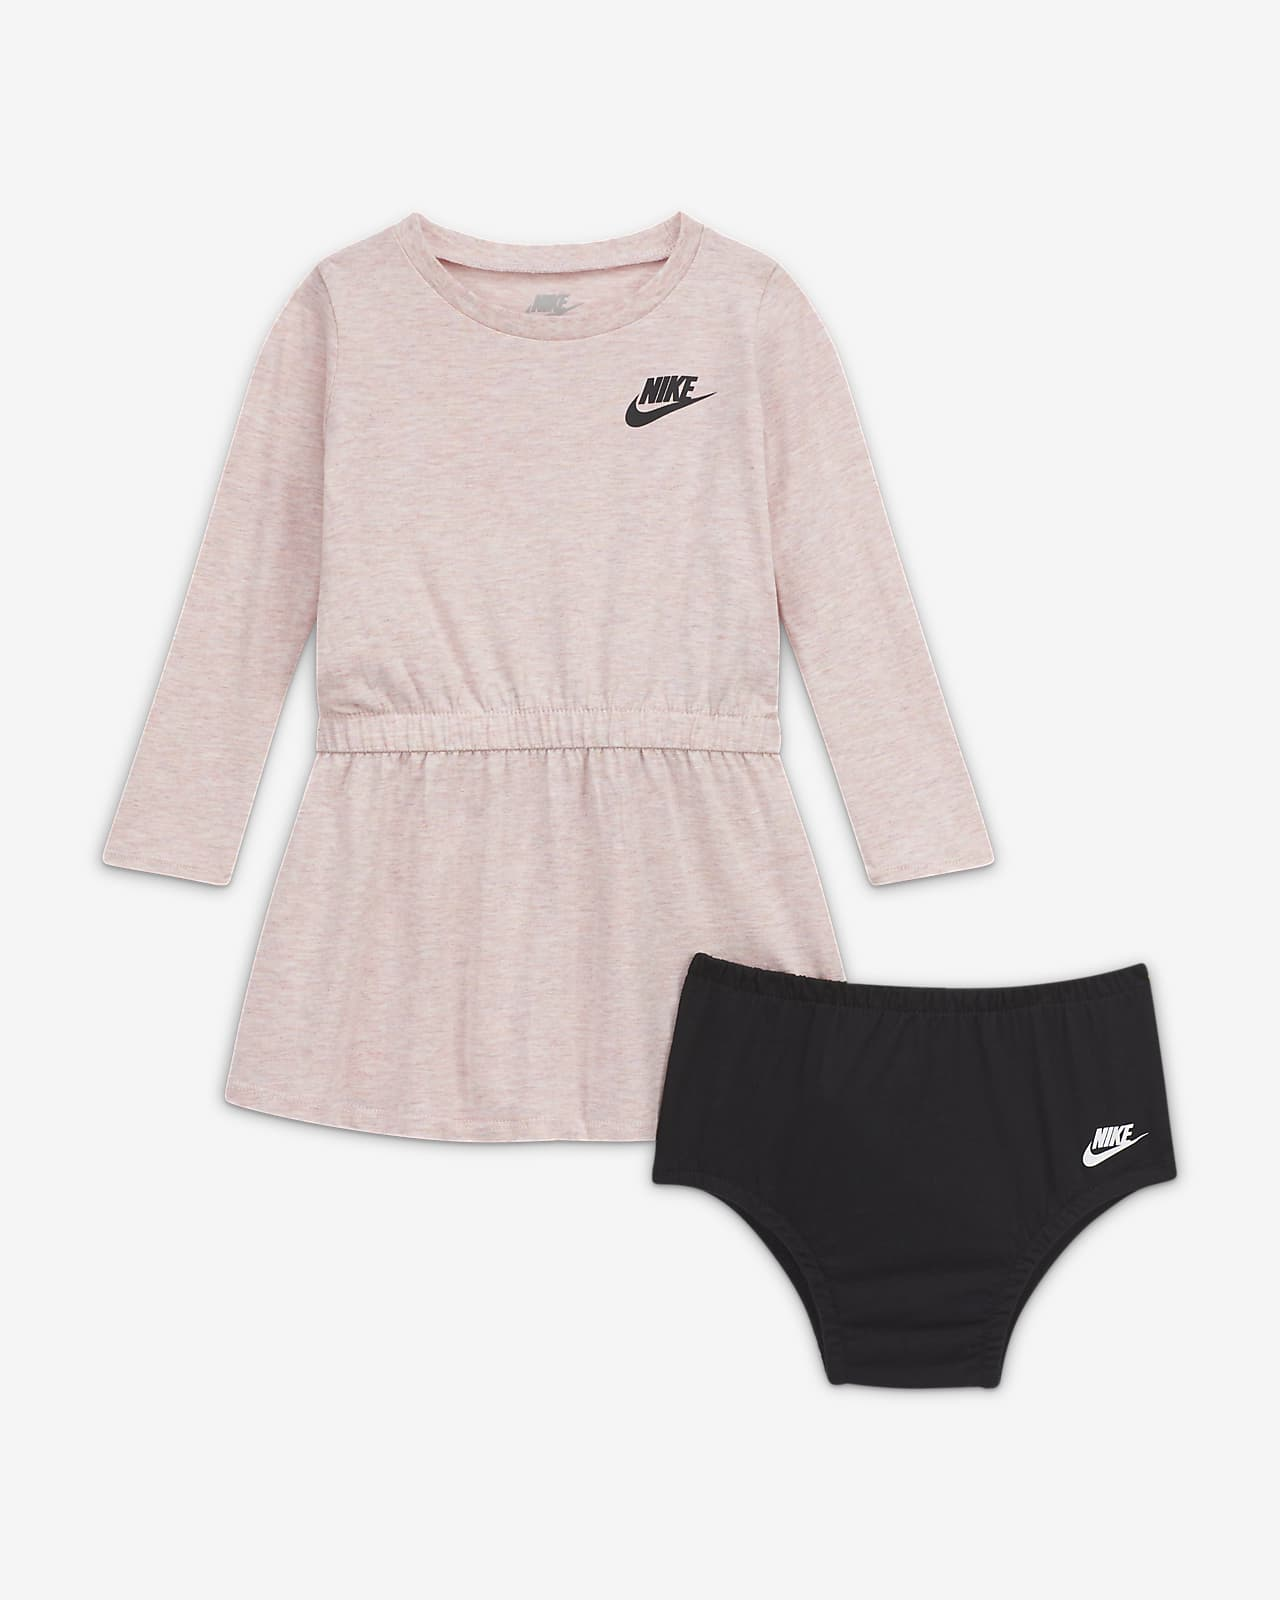 Nike Baby (12-24M) Dress. Nike.com